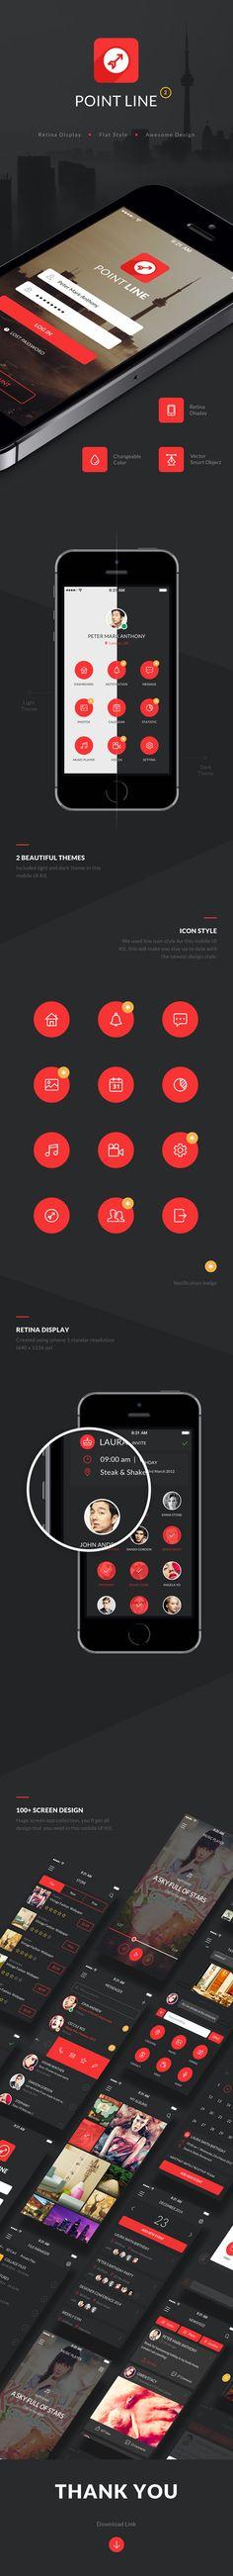 Graphic Design Inspiration - Web Design Inspiration - Press Kit - Media Kit - iphone - screenshots - app - Point Mobile UI Kit